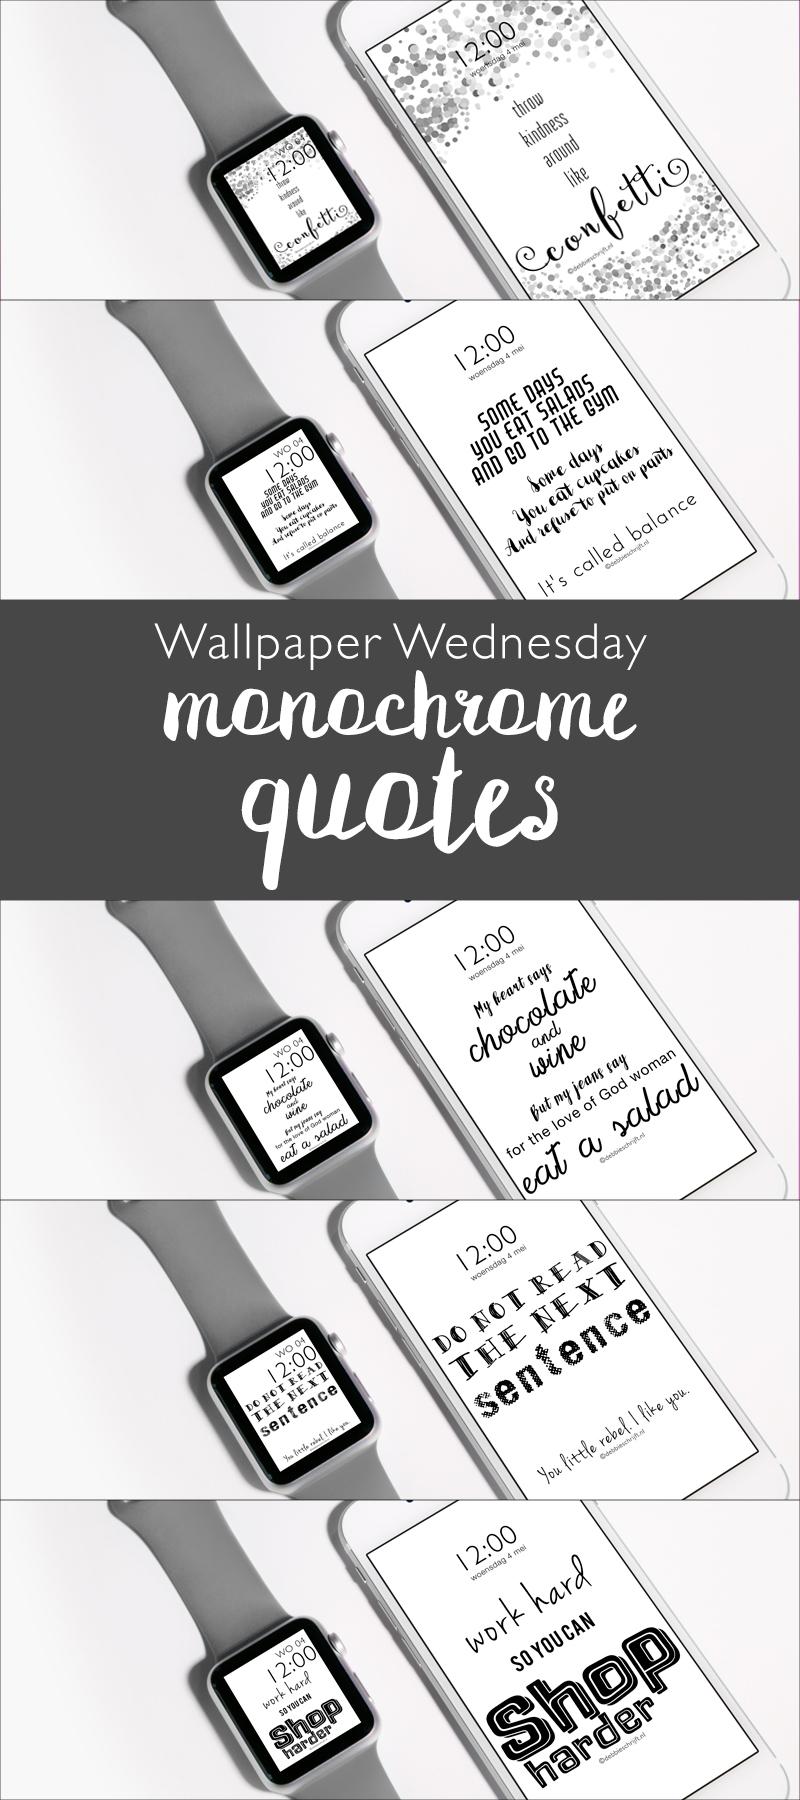 wallpaper wednesday monochrome quotes